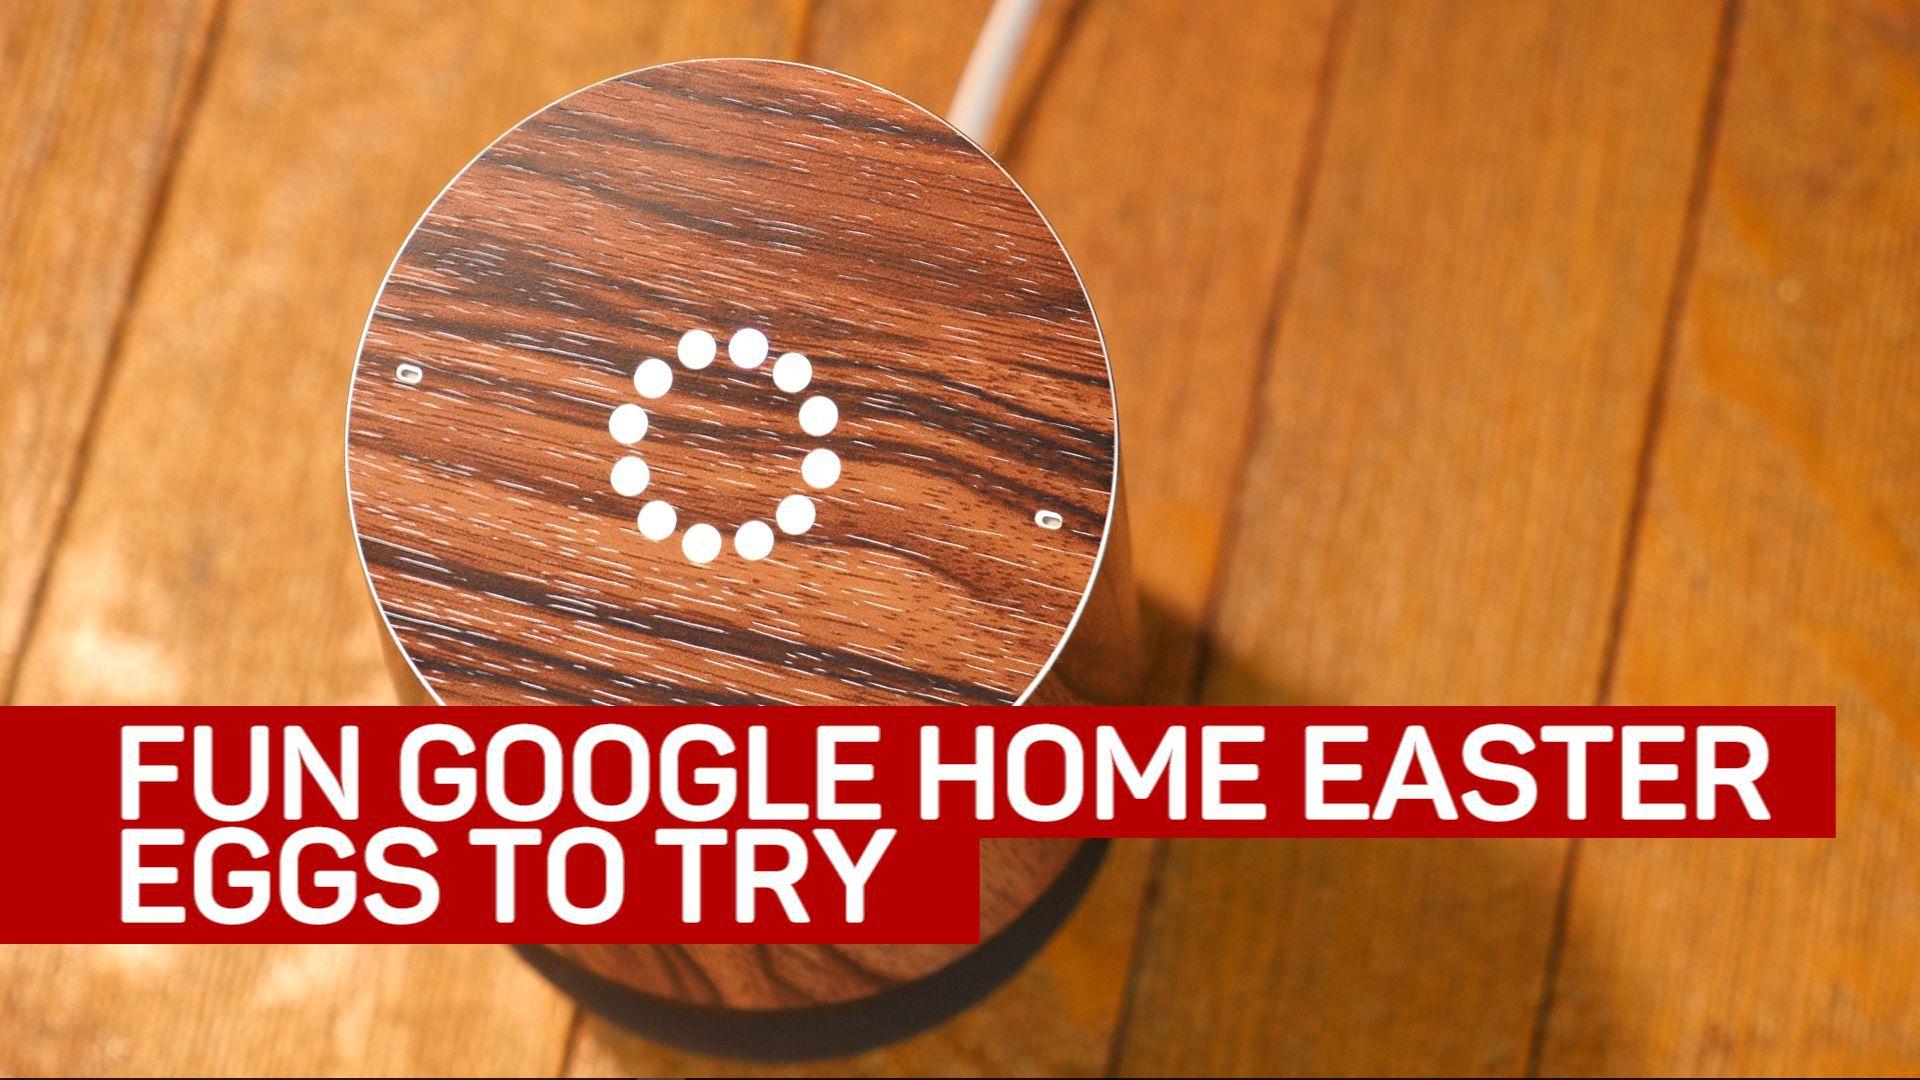 Google Home Easter Eggs 2019: 50+ Best *NEW* Commands List